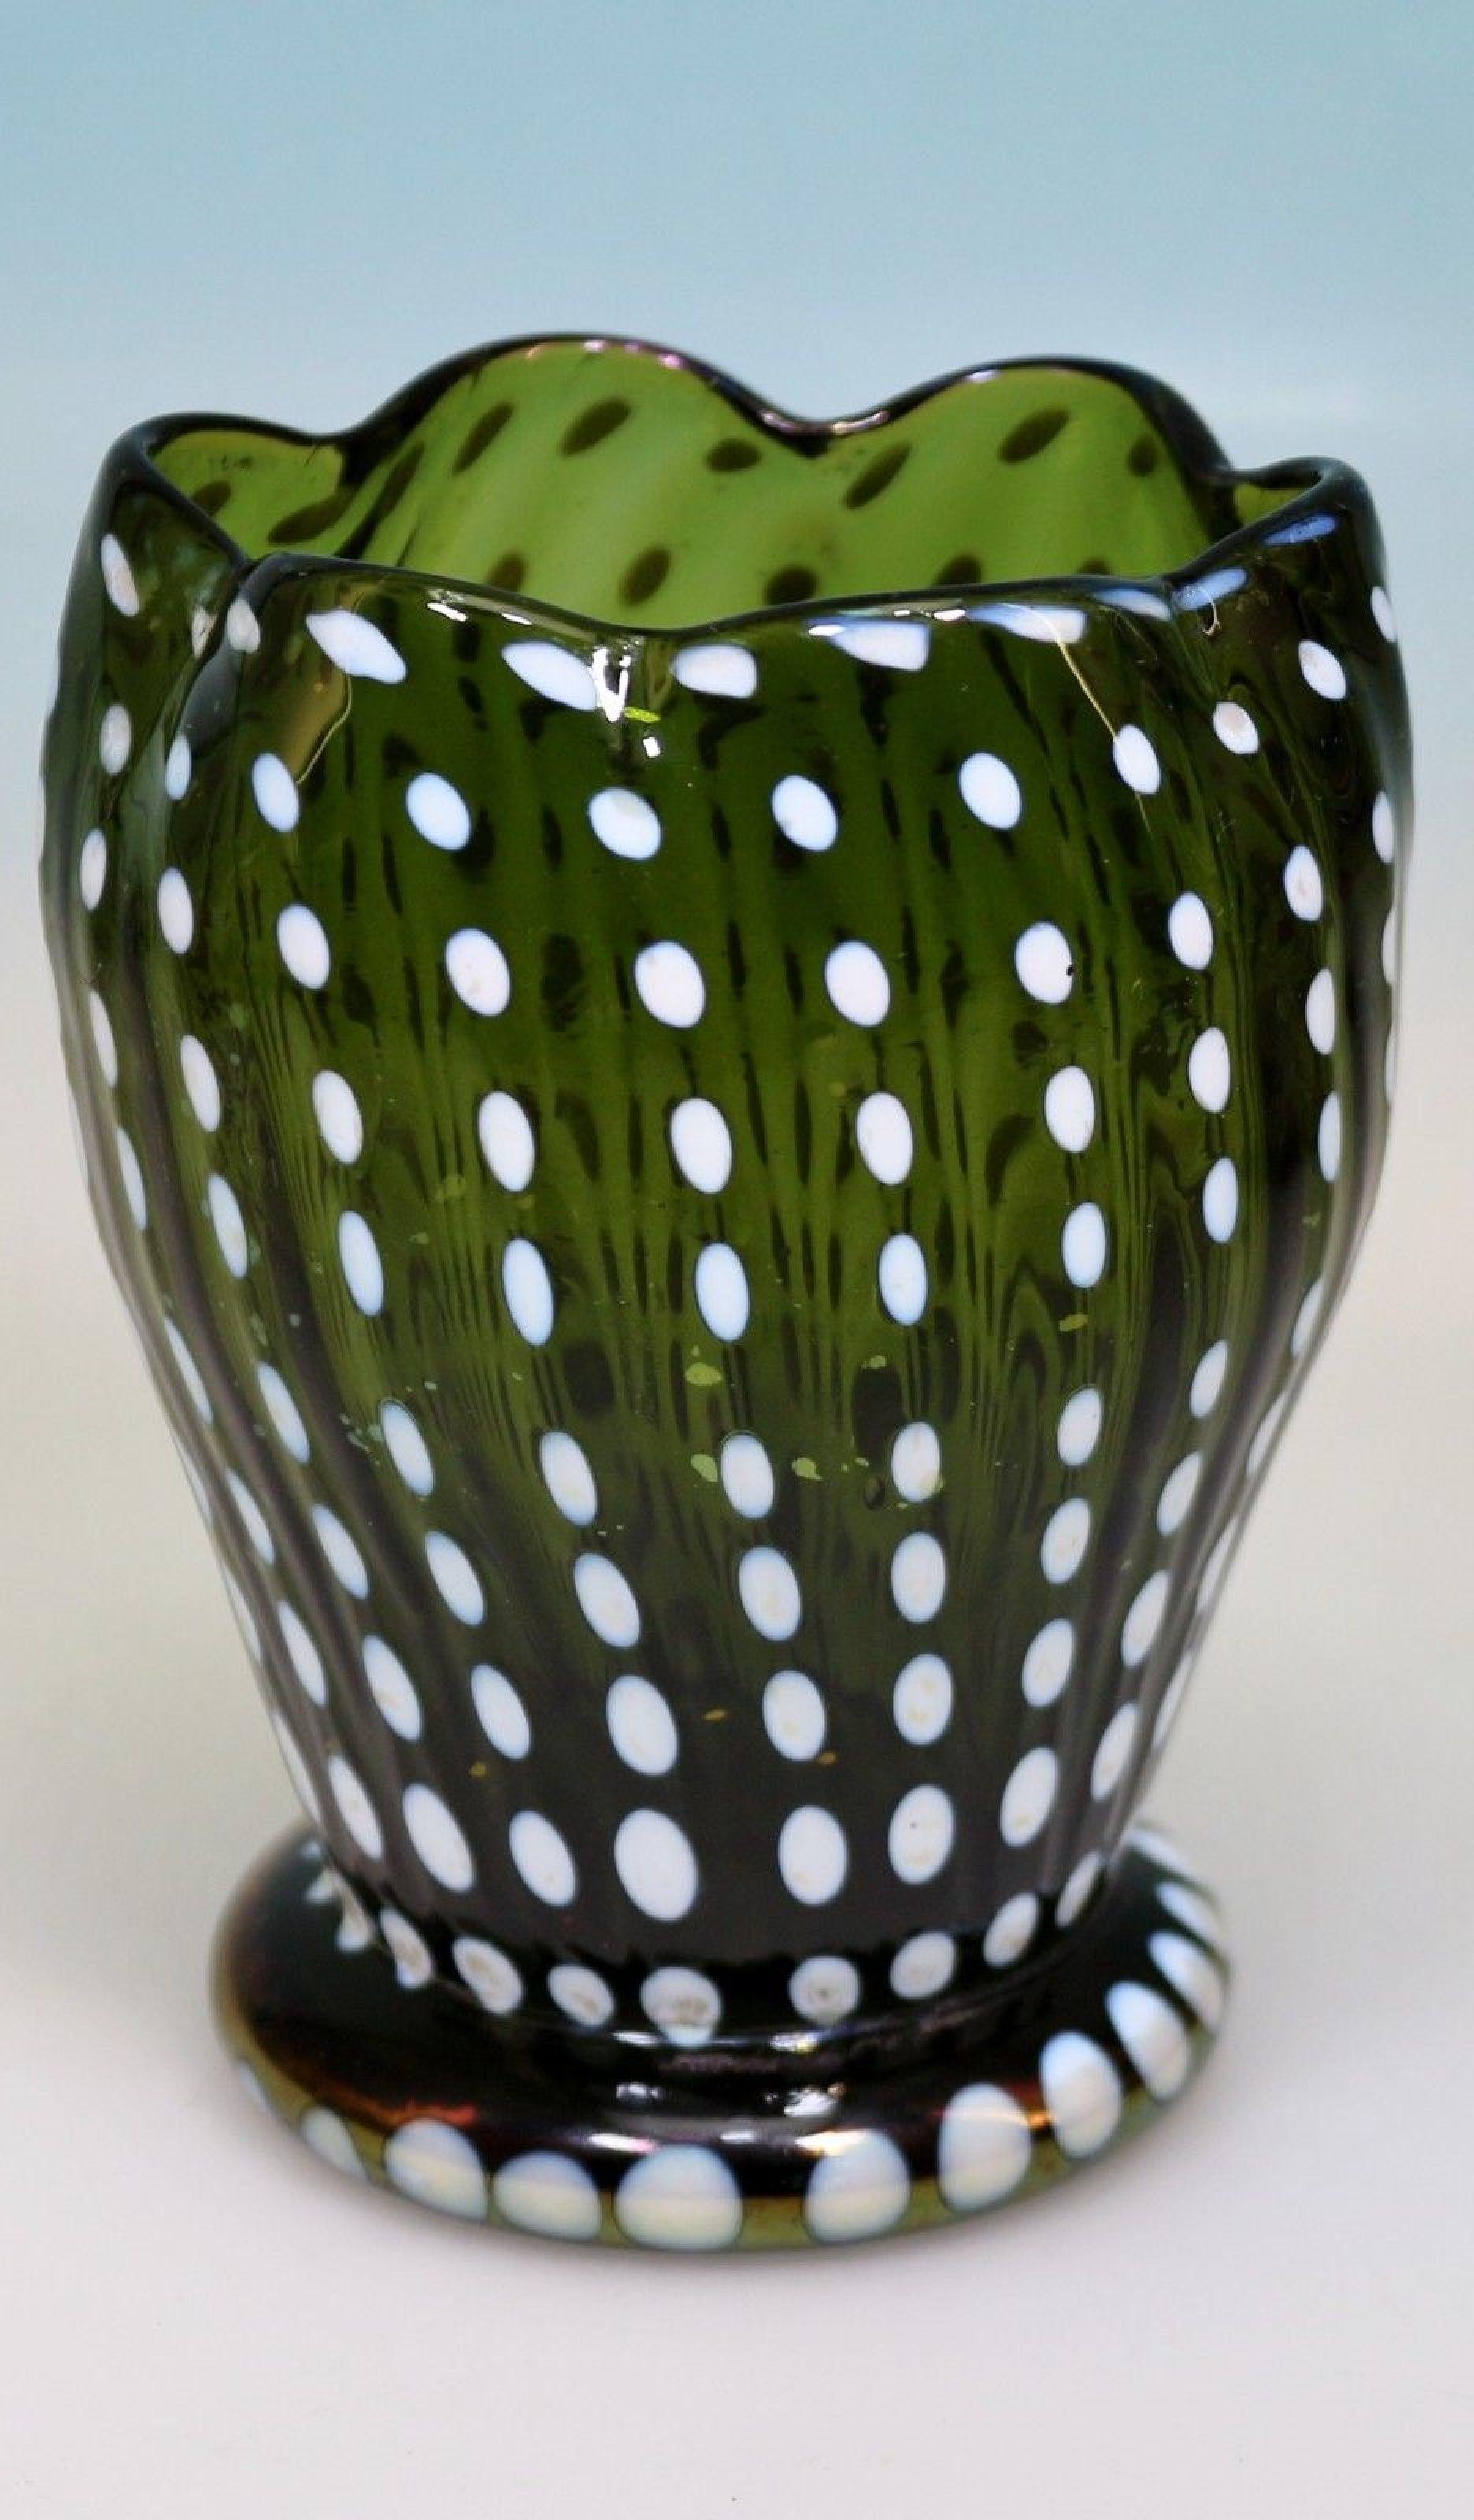 green blown glass vase of la¶tz art deco vase bronzeirisierung punktdekor loetz loetz for la¶tz art deco vase bronzeirisierung punktdekor loetz